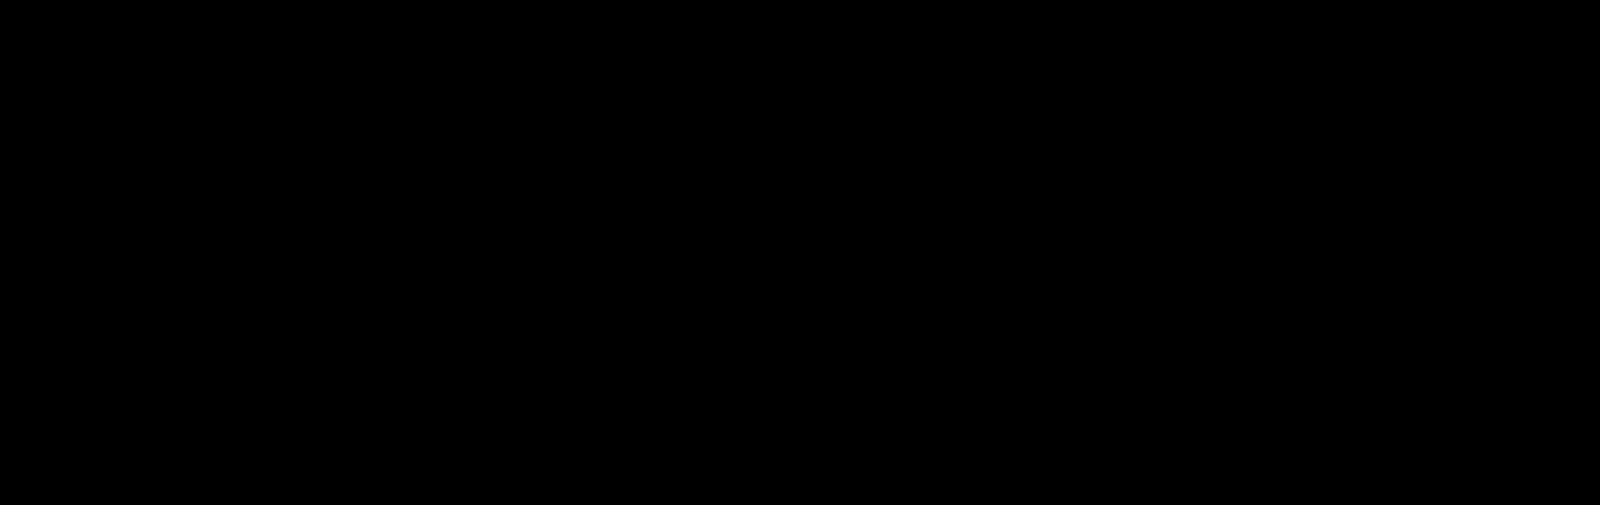 Png mart. Zipper clipart transparent background